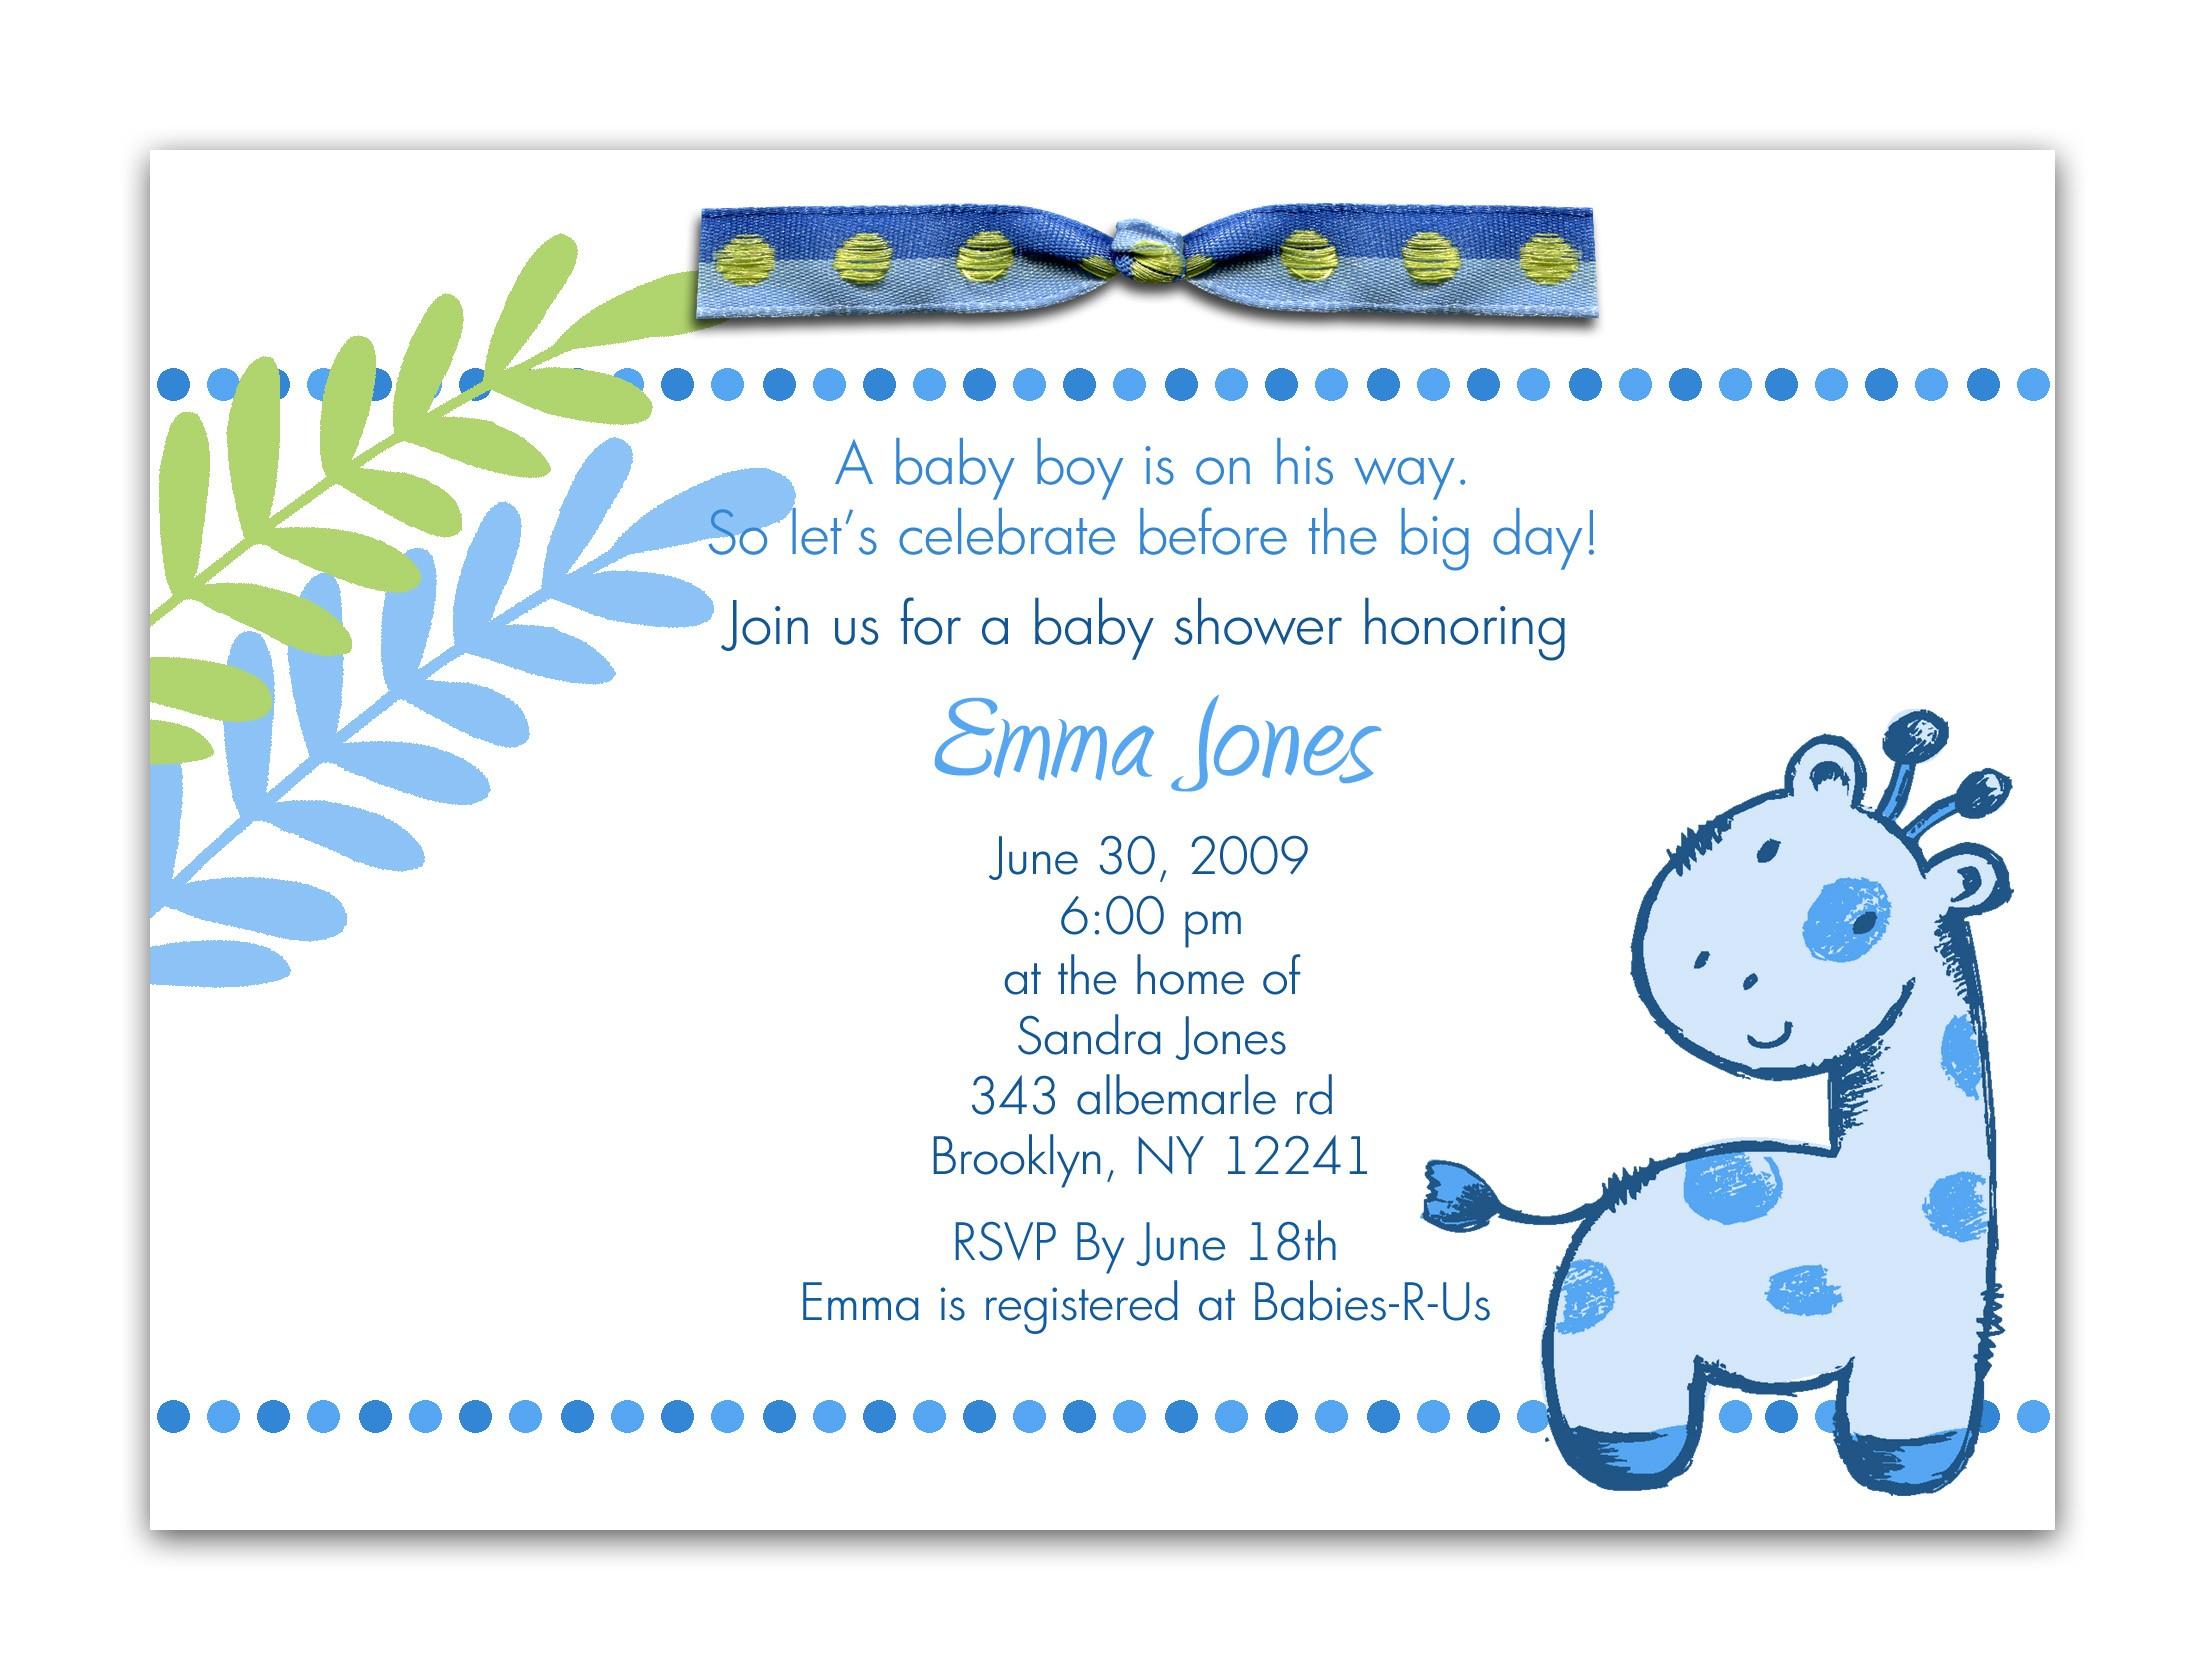 10 Trendy Baby Boy Shower Invitation Ideas baby shower invitation wording for a boy kinderhooktap